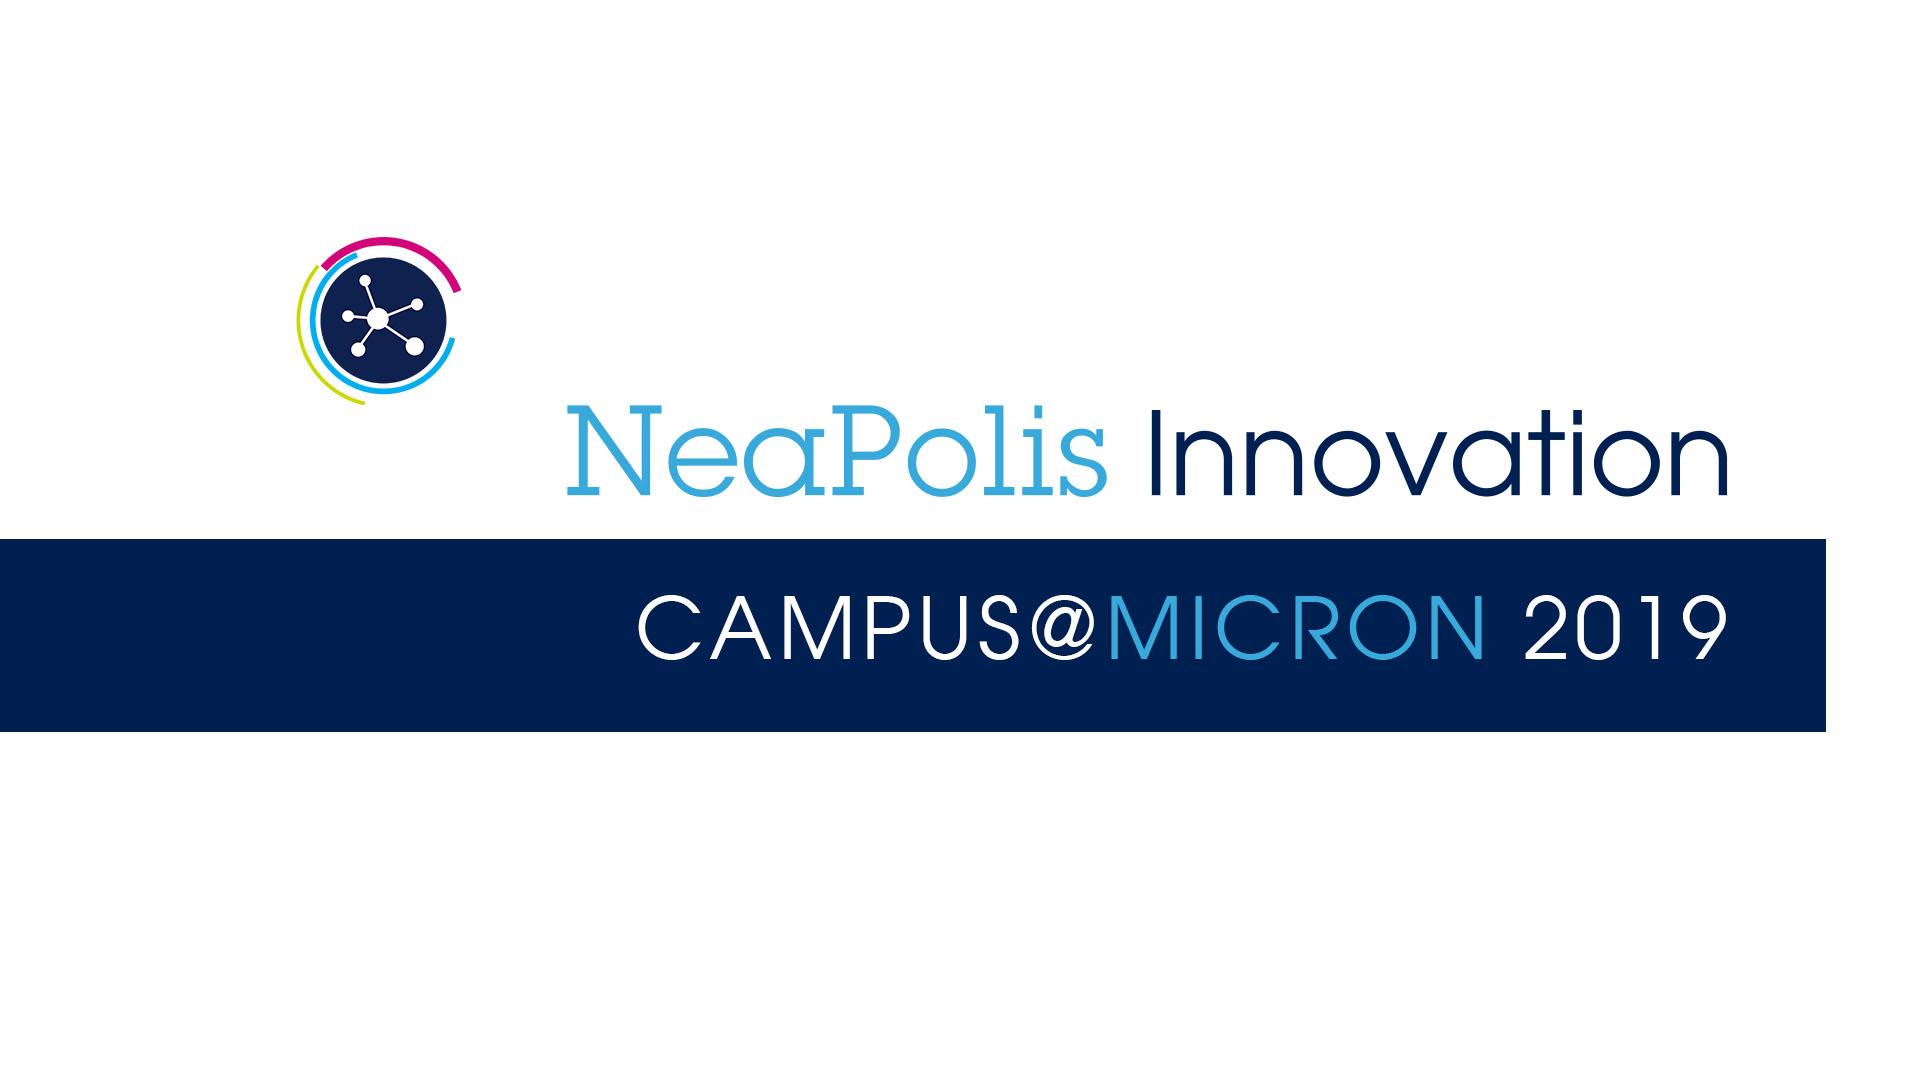 Campus@Micron 2019